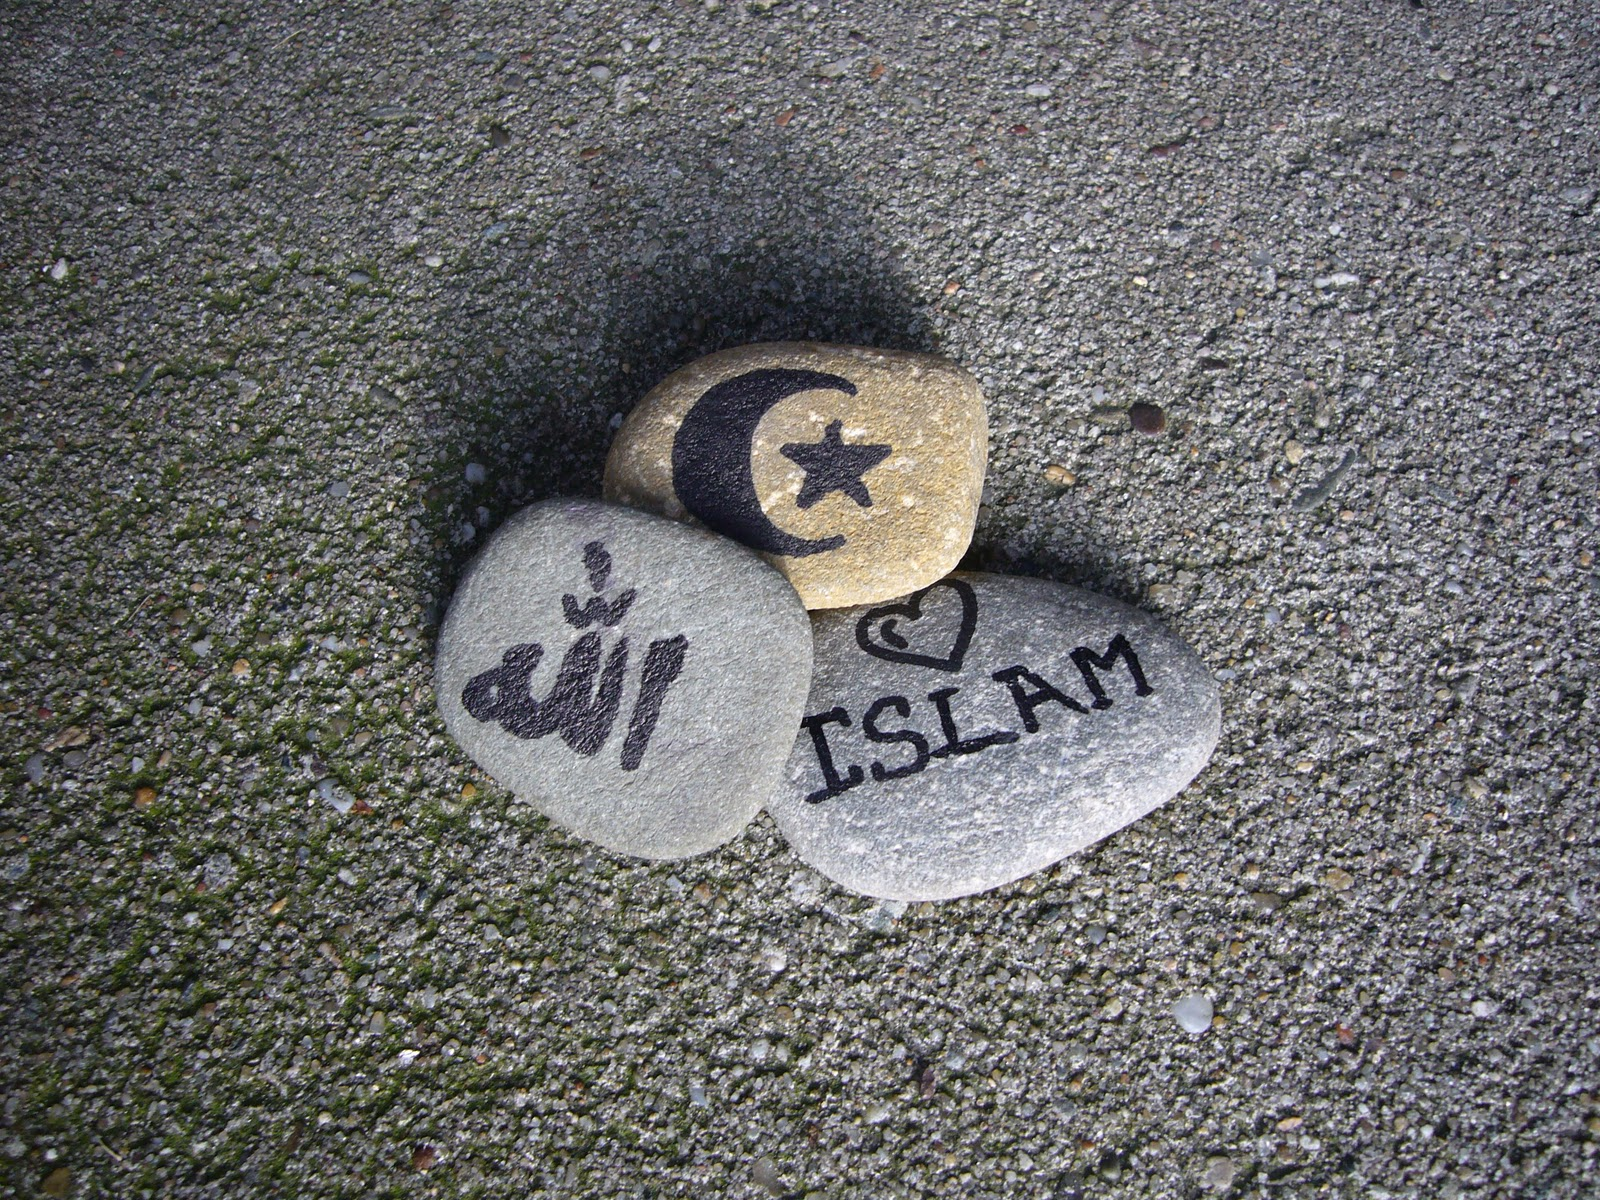 http://1.bp.blogspot.com/-7UP_6msCt-A/TxIJkHNHjqI/AAAAAAAABHU/Wa51M_mvp2w/s1600/islam.jpg